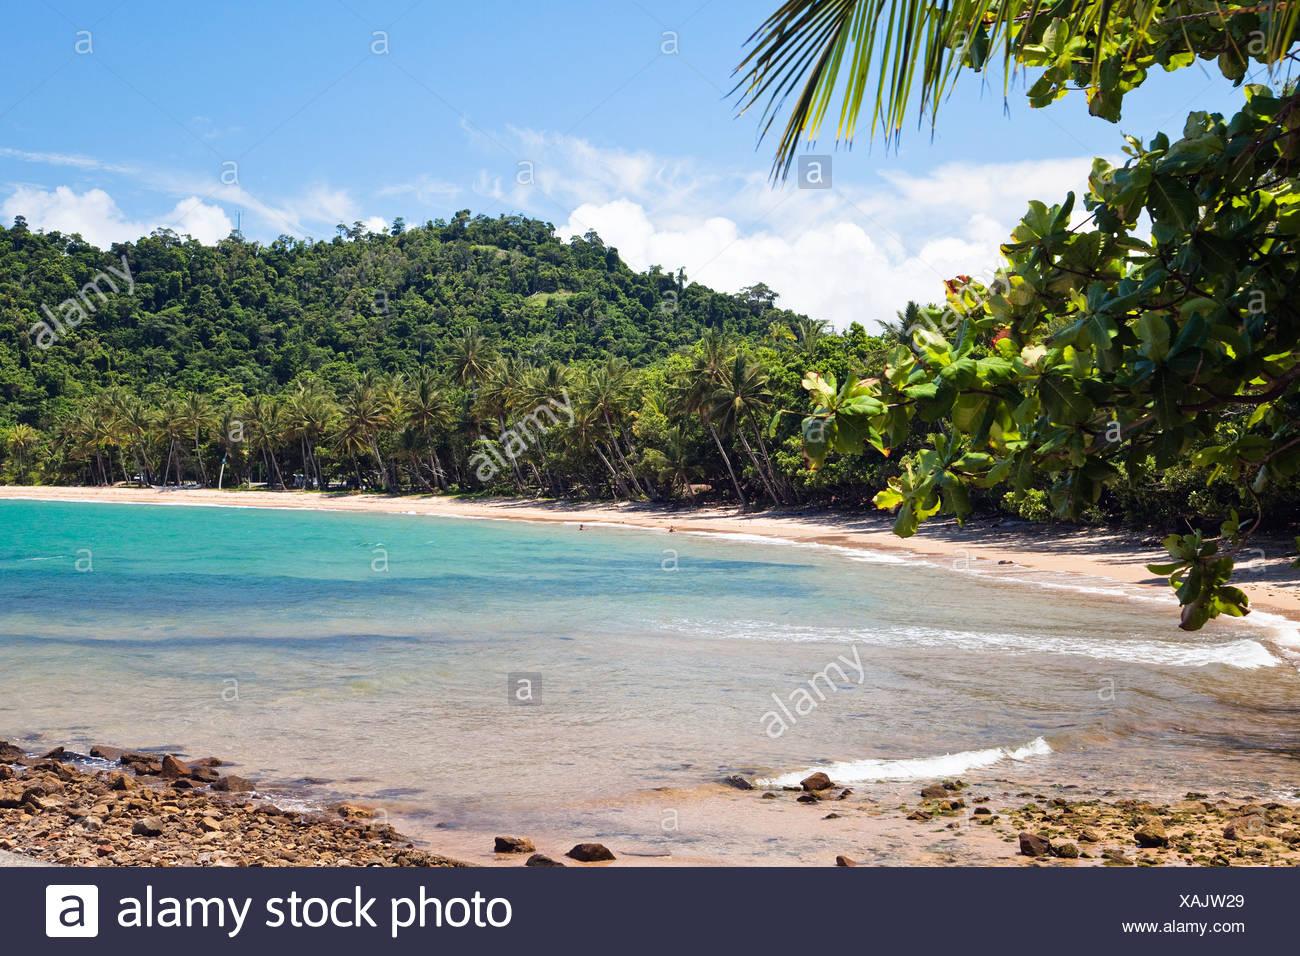 Mission Beach near Innisfail, Queensland, Australia - Stock Image